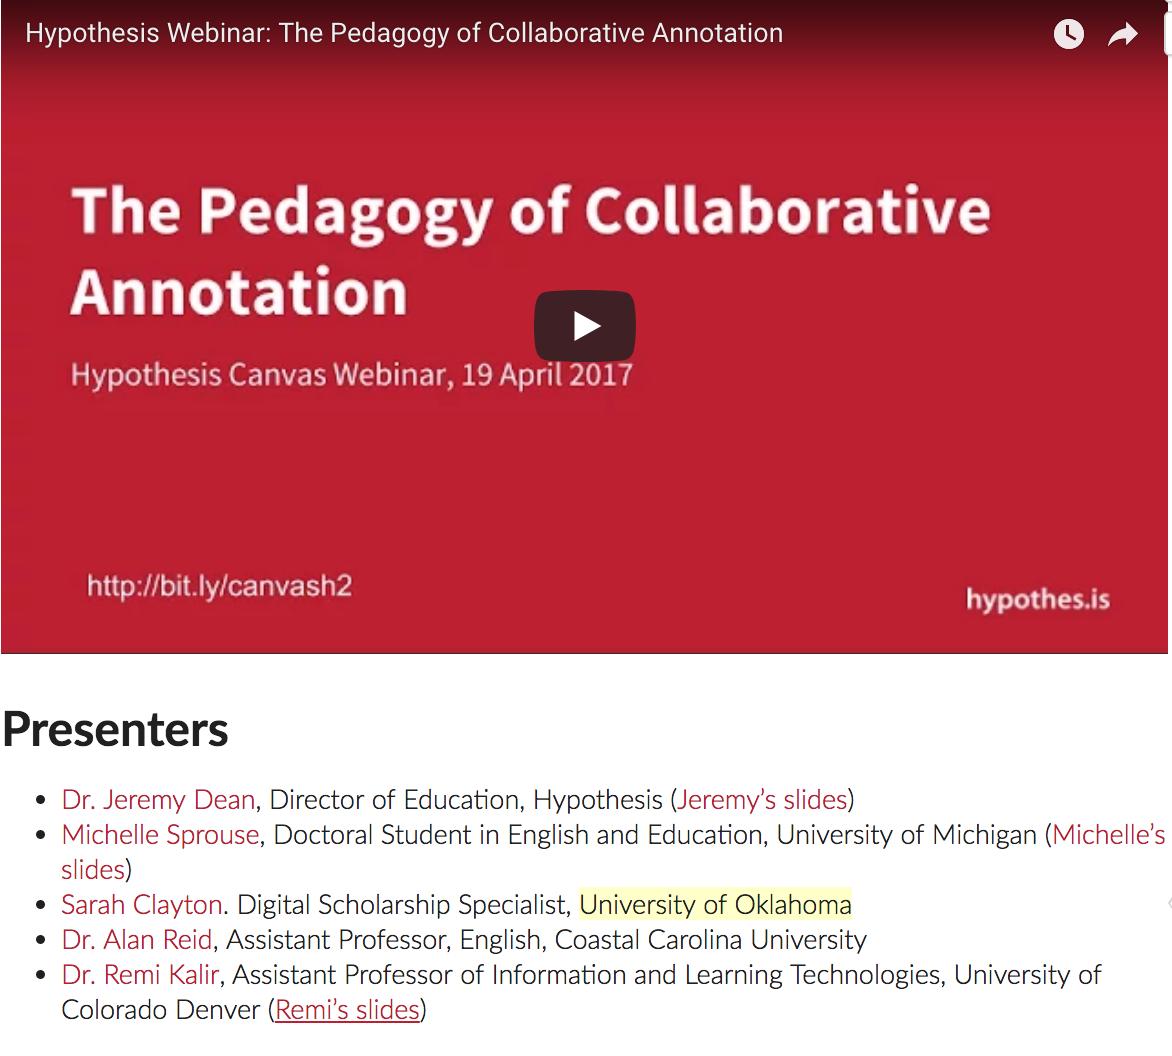 The pedagogy of collaborative annotation   Hypothesis Webinar